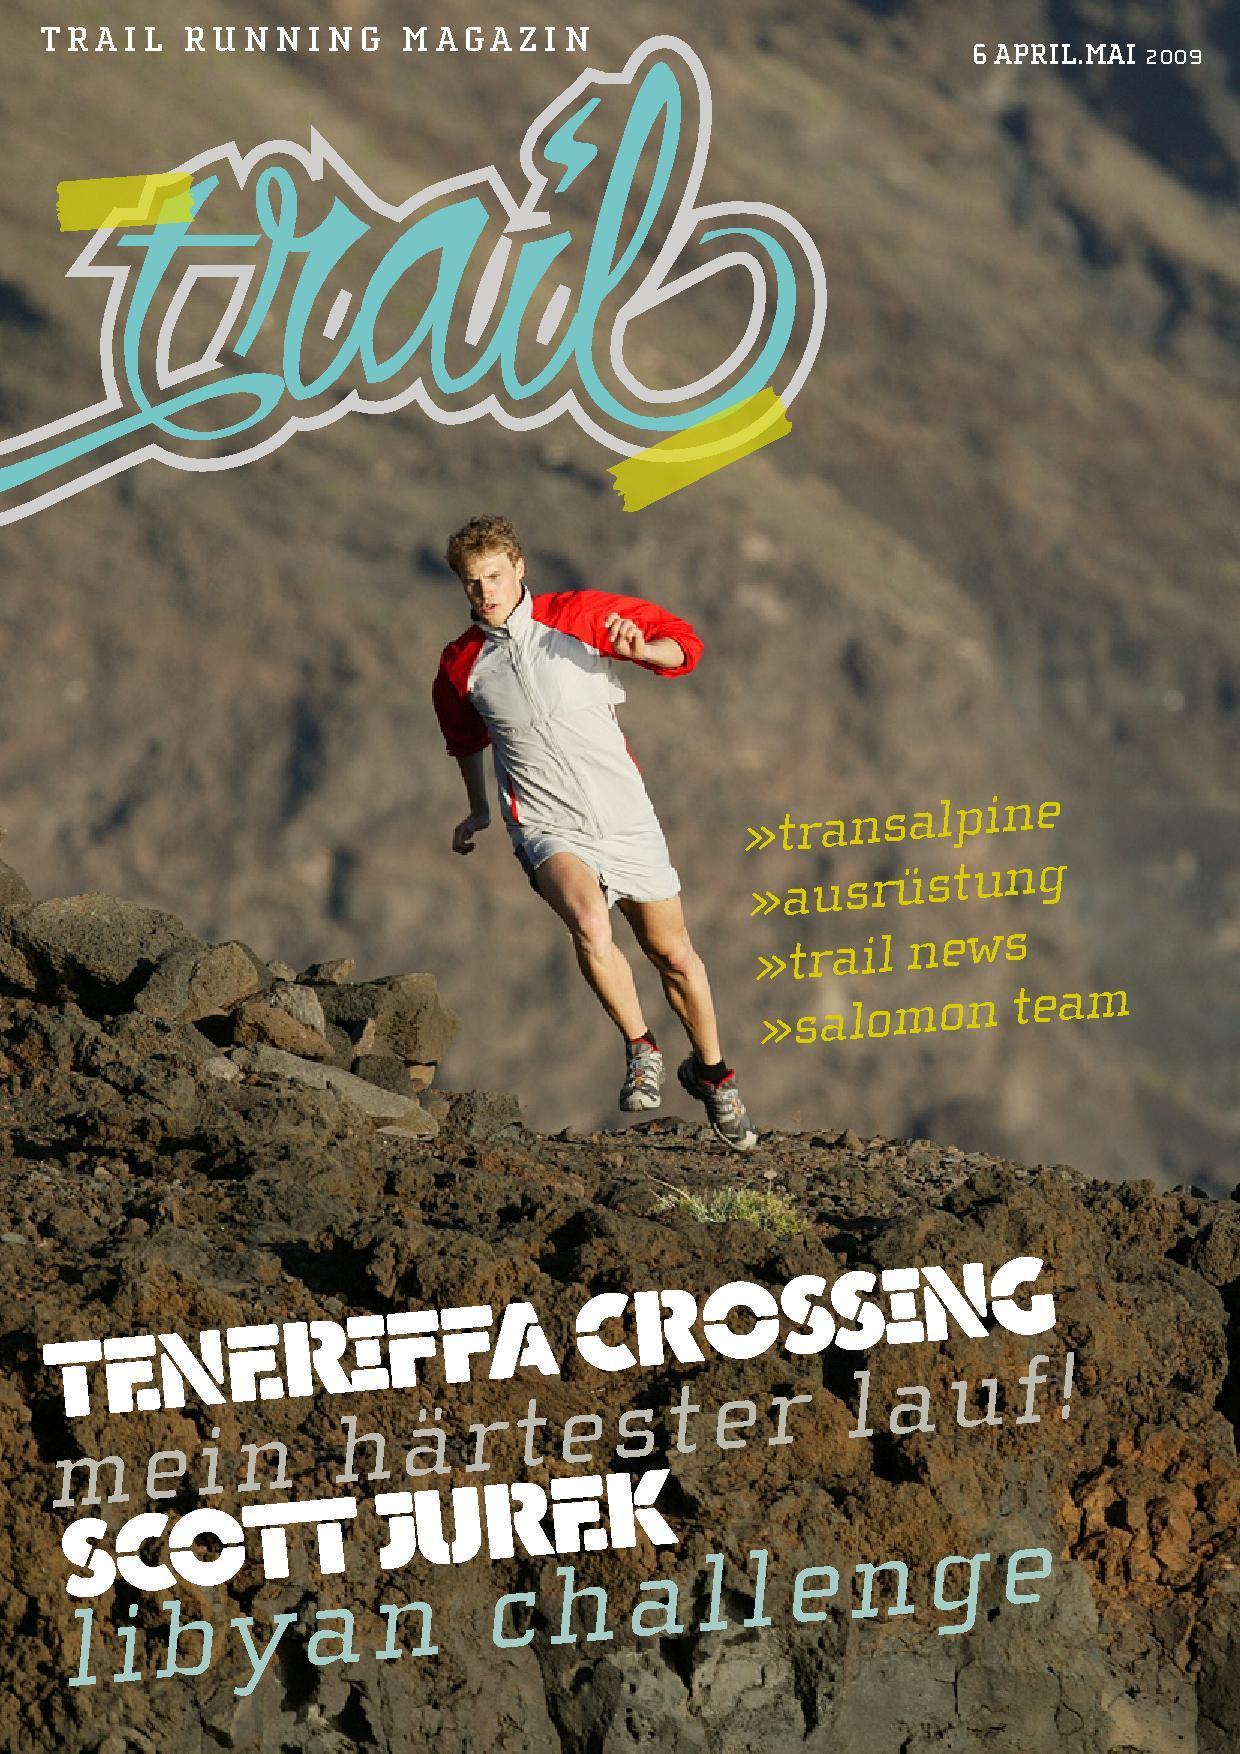 Trail Running mit Salomon Magazin Trailrunning